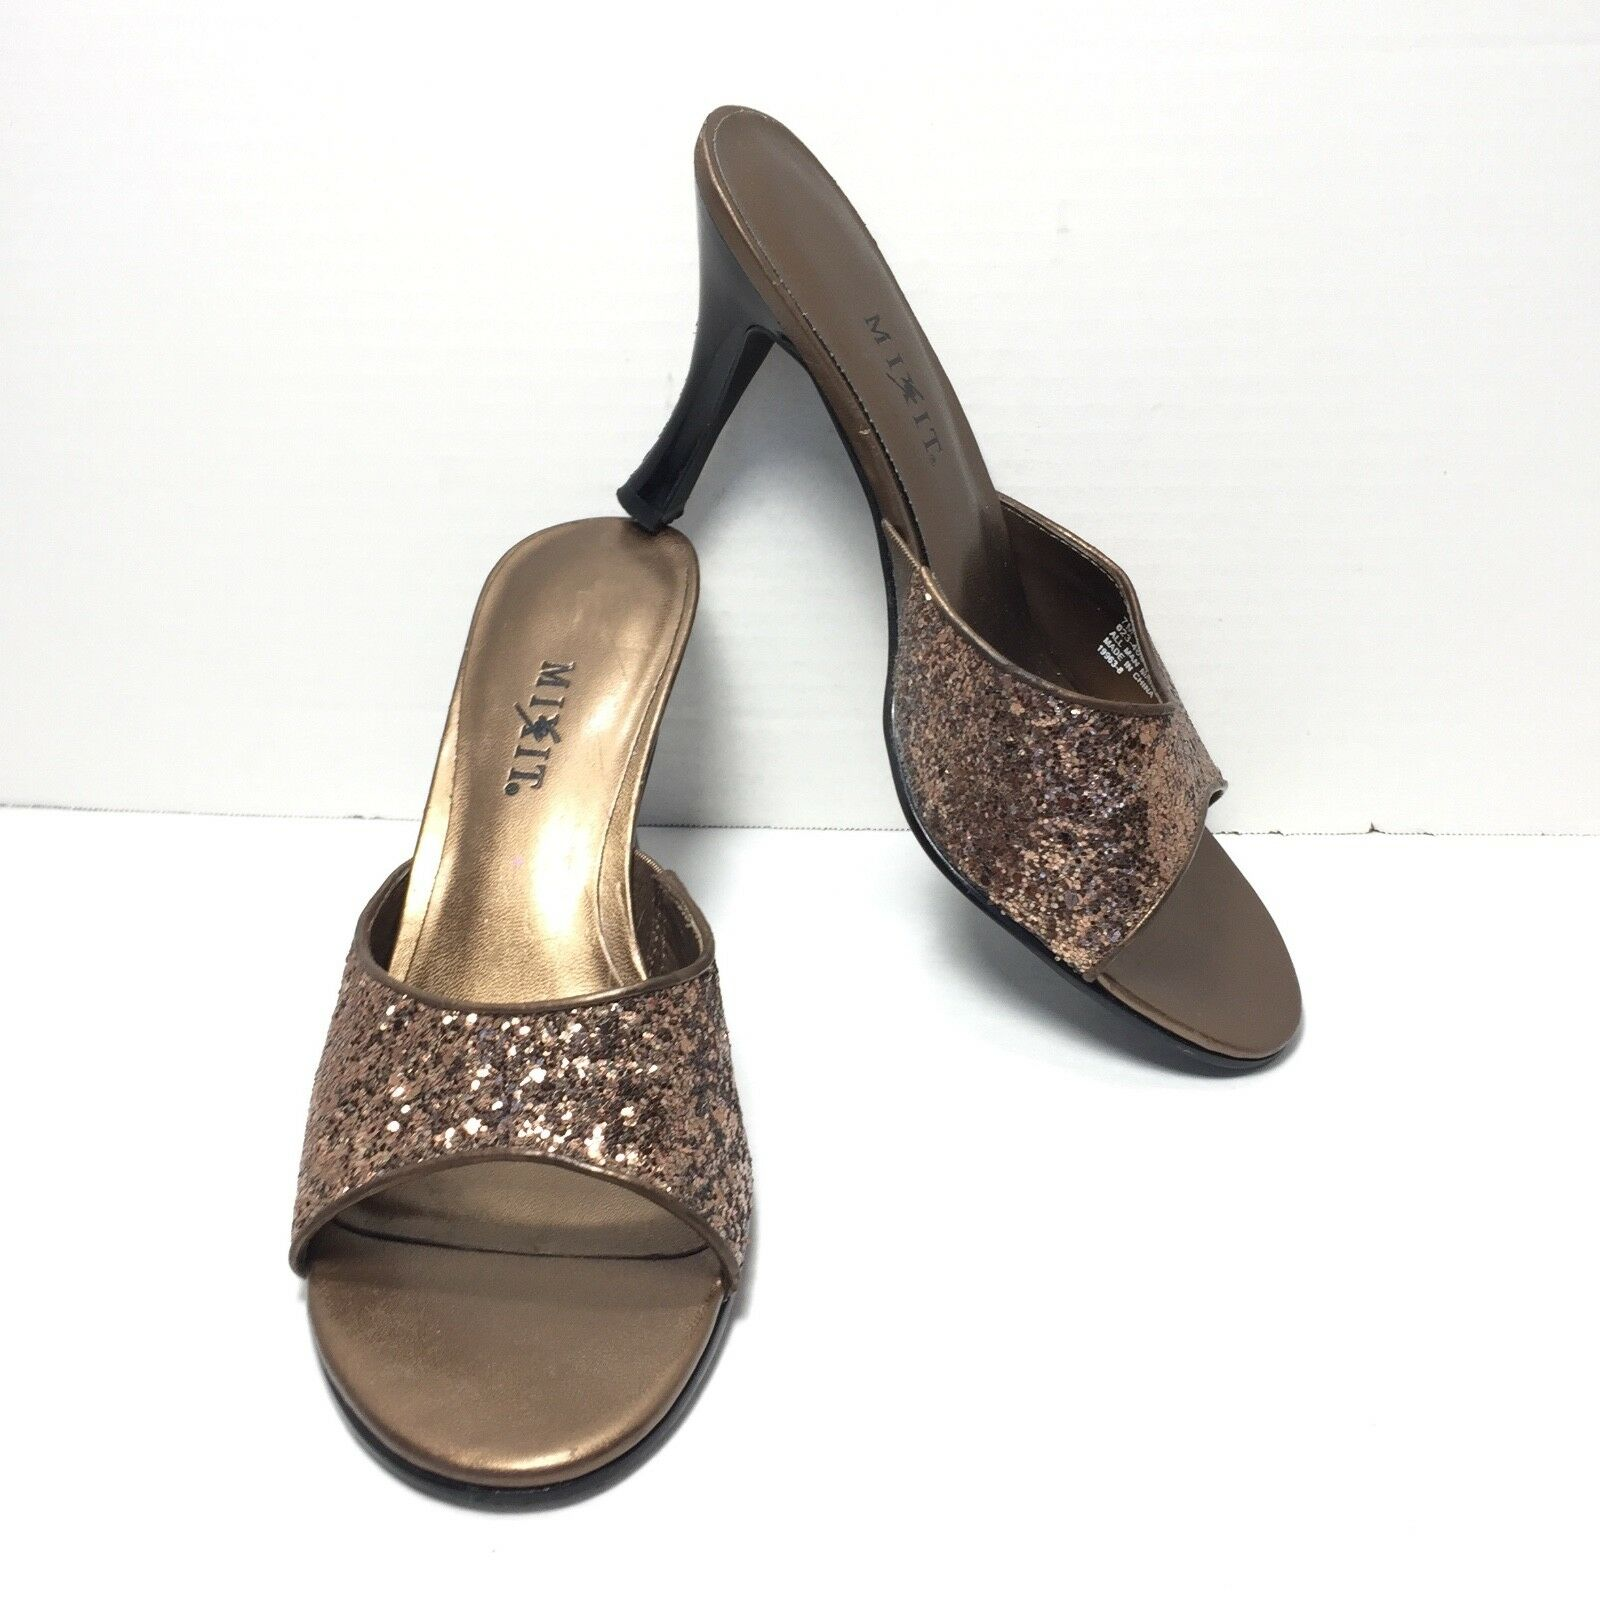 Women's Heel Mix It Brown Sparkle Kitten Heel Women's Mules Size 7 M 02d194